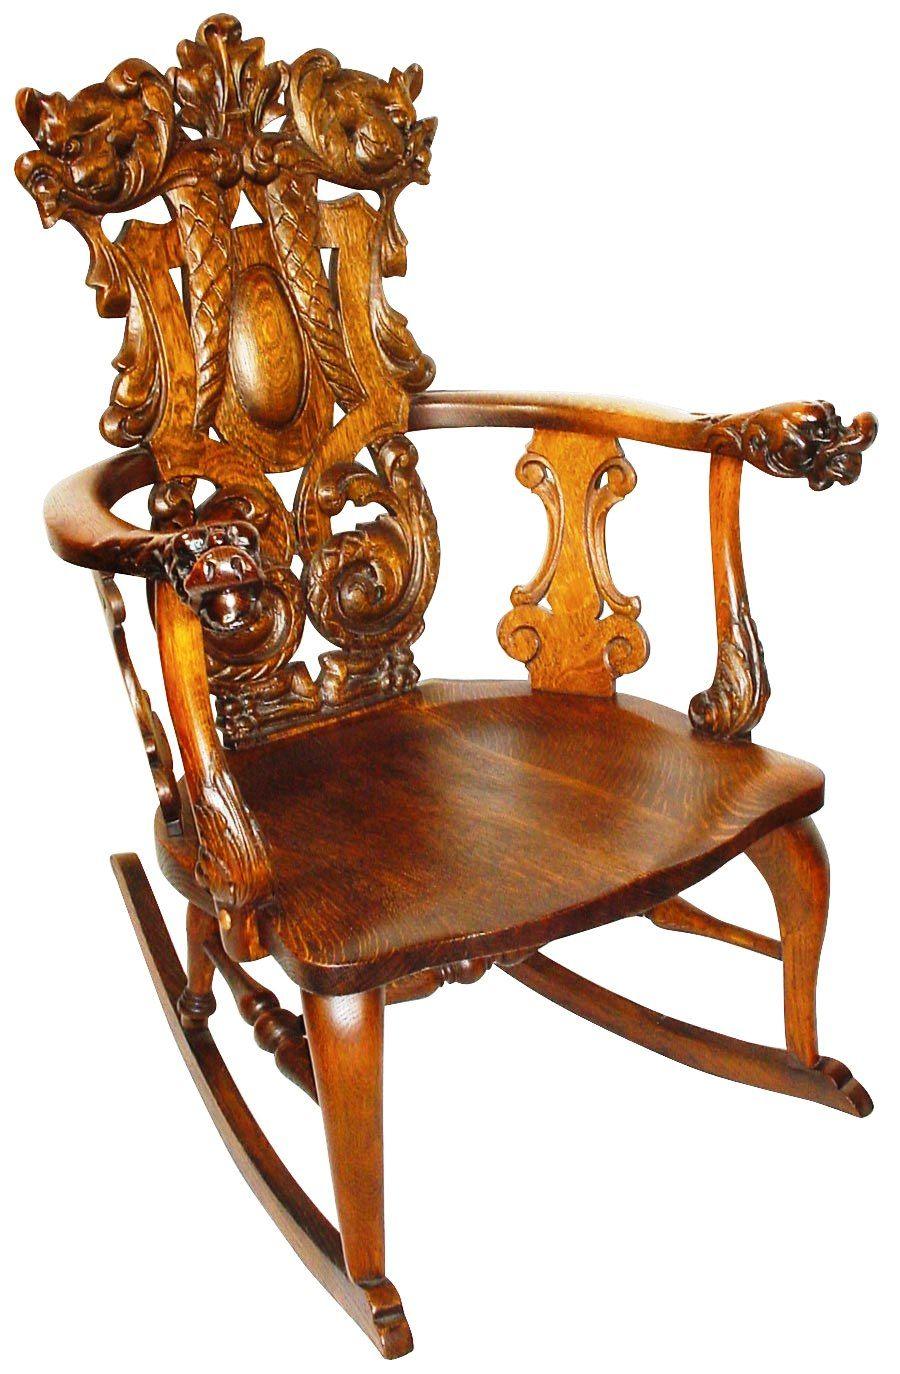 This ornately carved rocker is a Stickley, but not Gustav Stickley's work;  it was. Cardboard FurnitureWooden FurnitureFurniture ChairsVintage ... - This Ornately Carved Rocker Is A Stickley, But Not Gustav